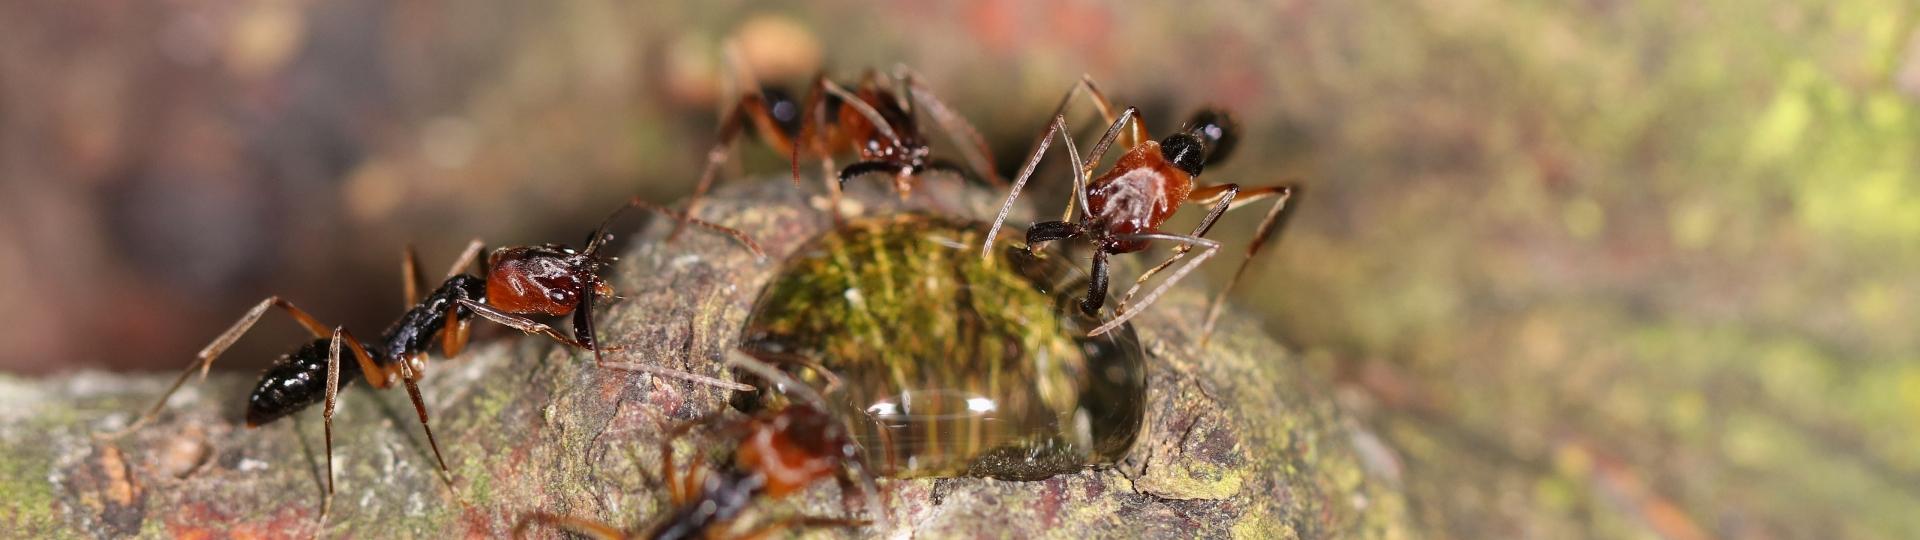 Odontomachus erythrocephalus 29 Arbeiterinnen am Invertzucker 03